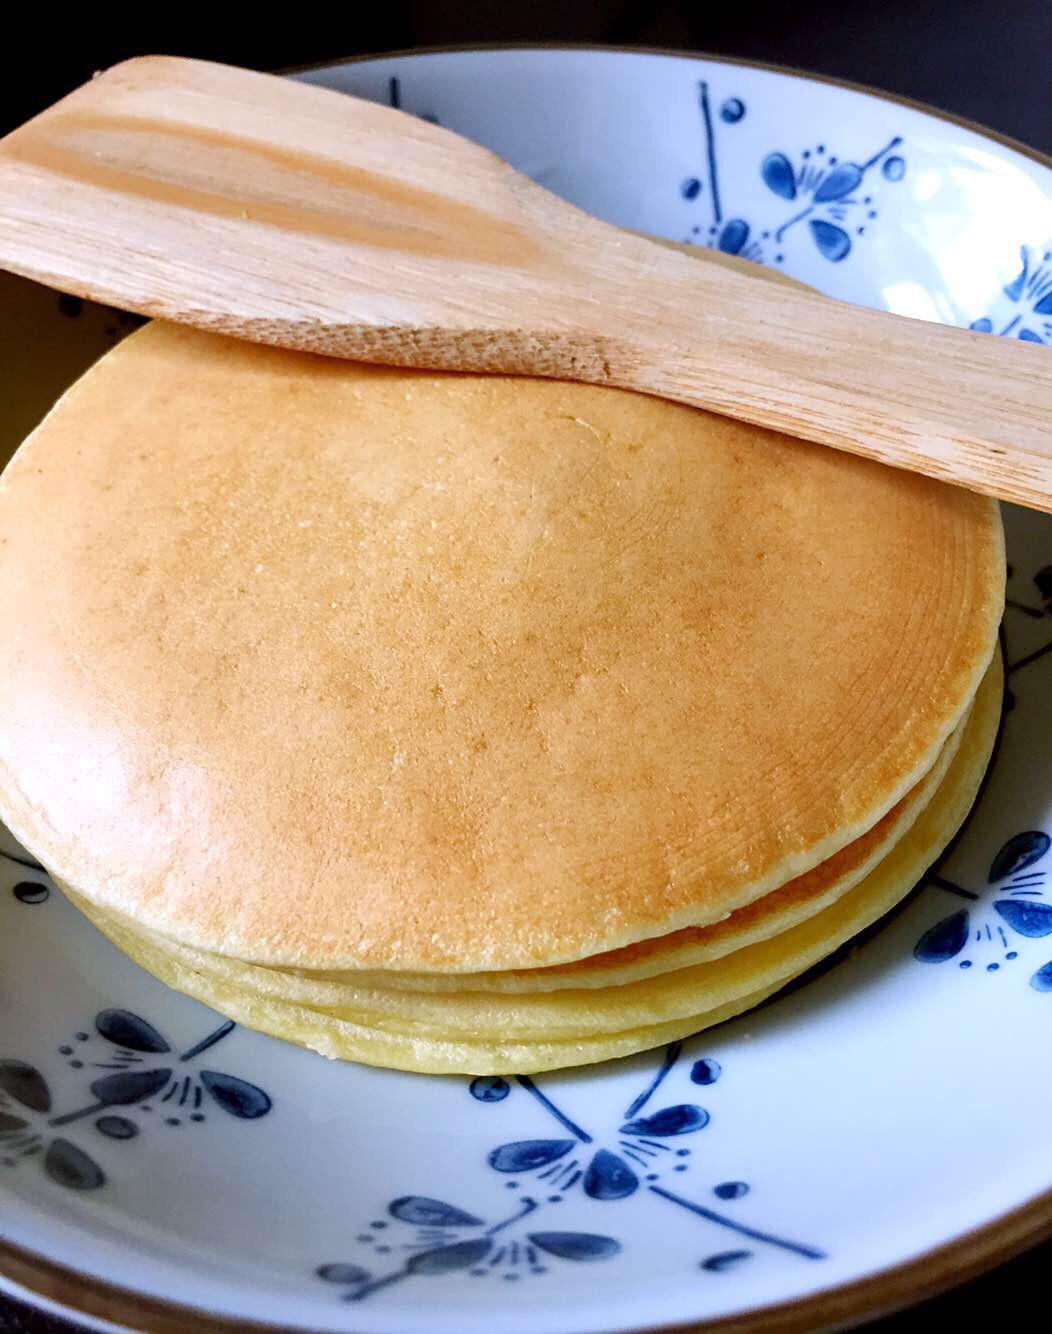 ellas kitchen baby food brass faucet 婴儿食品 下厨房 宝宝辅食 香蕉松饼